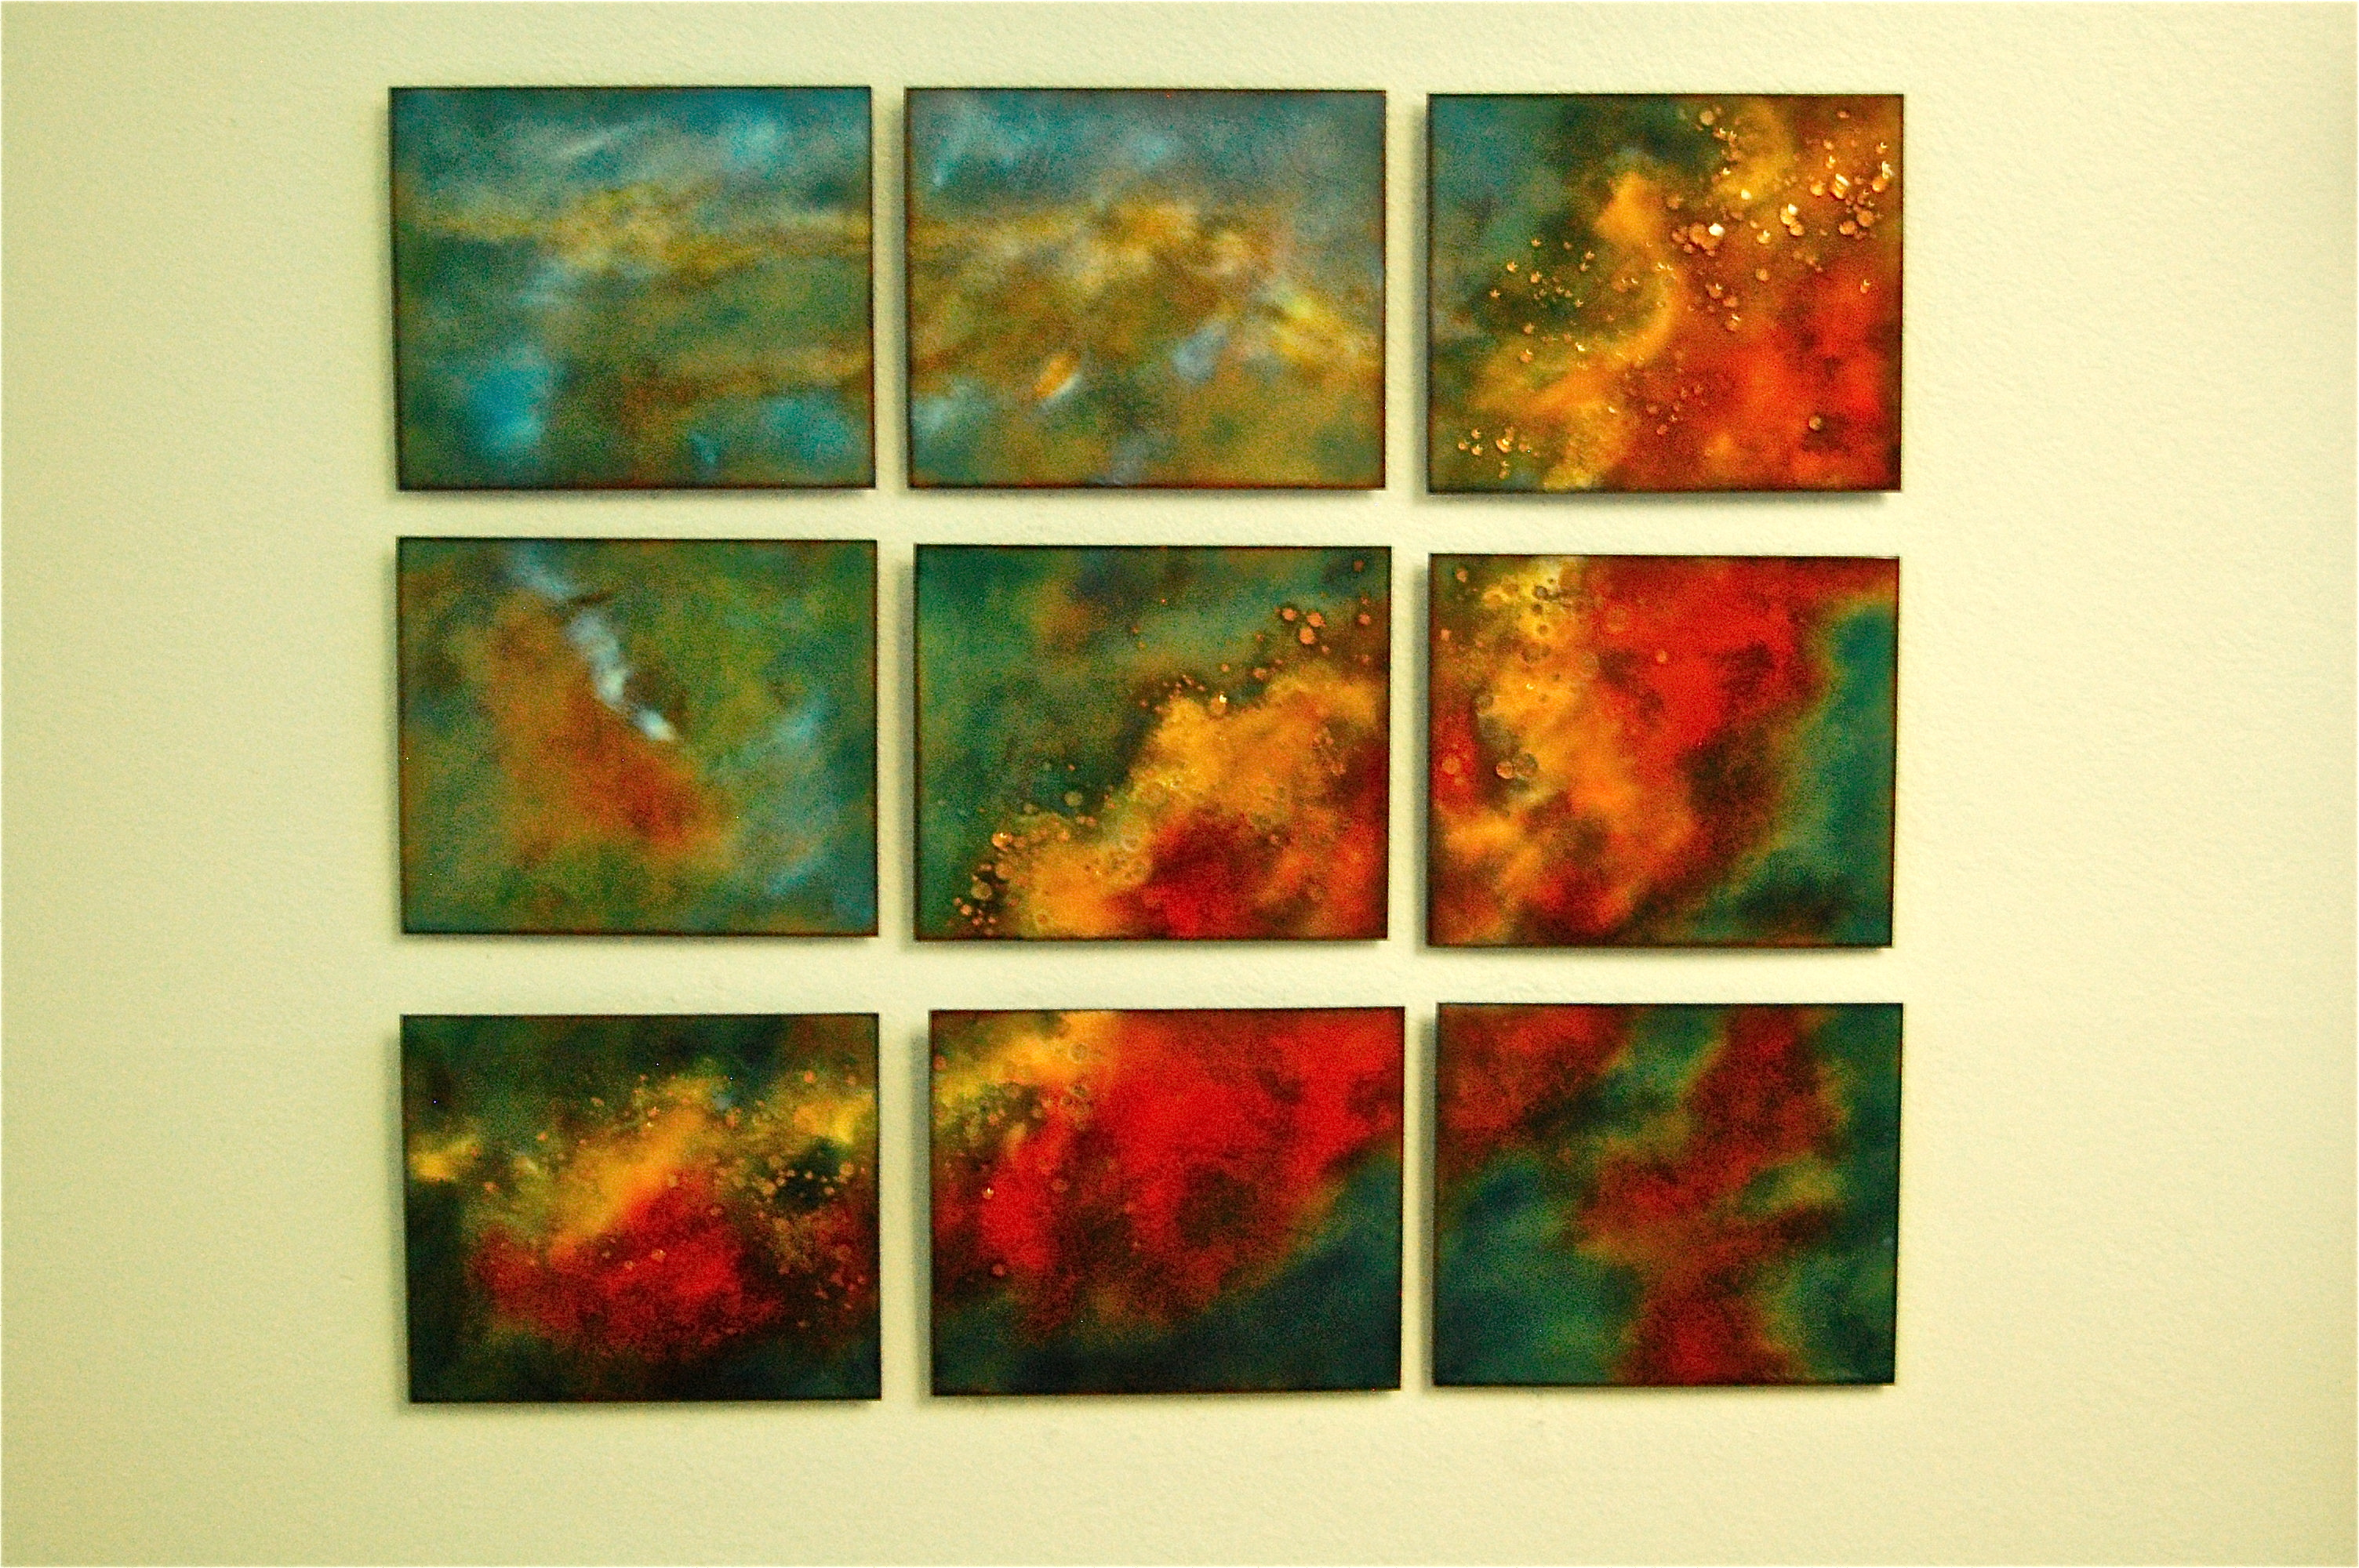 Fine Glass Wall Art Panels Model - Wall Art Collections ...